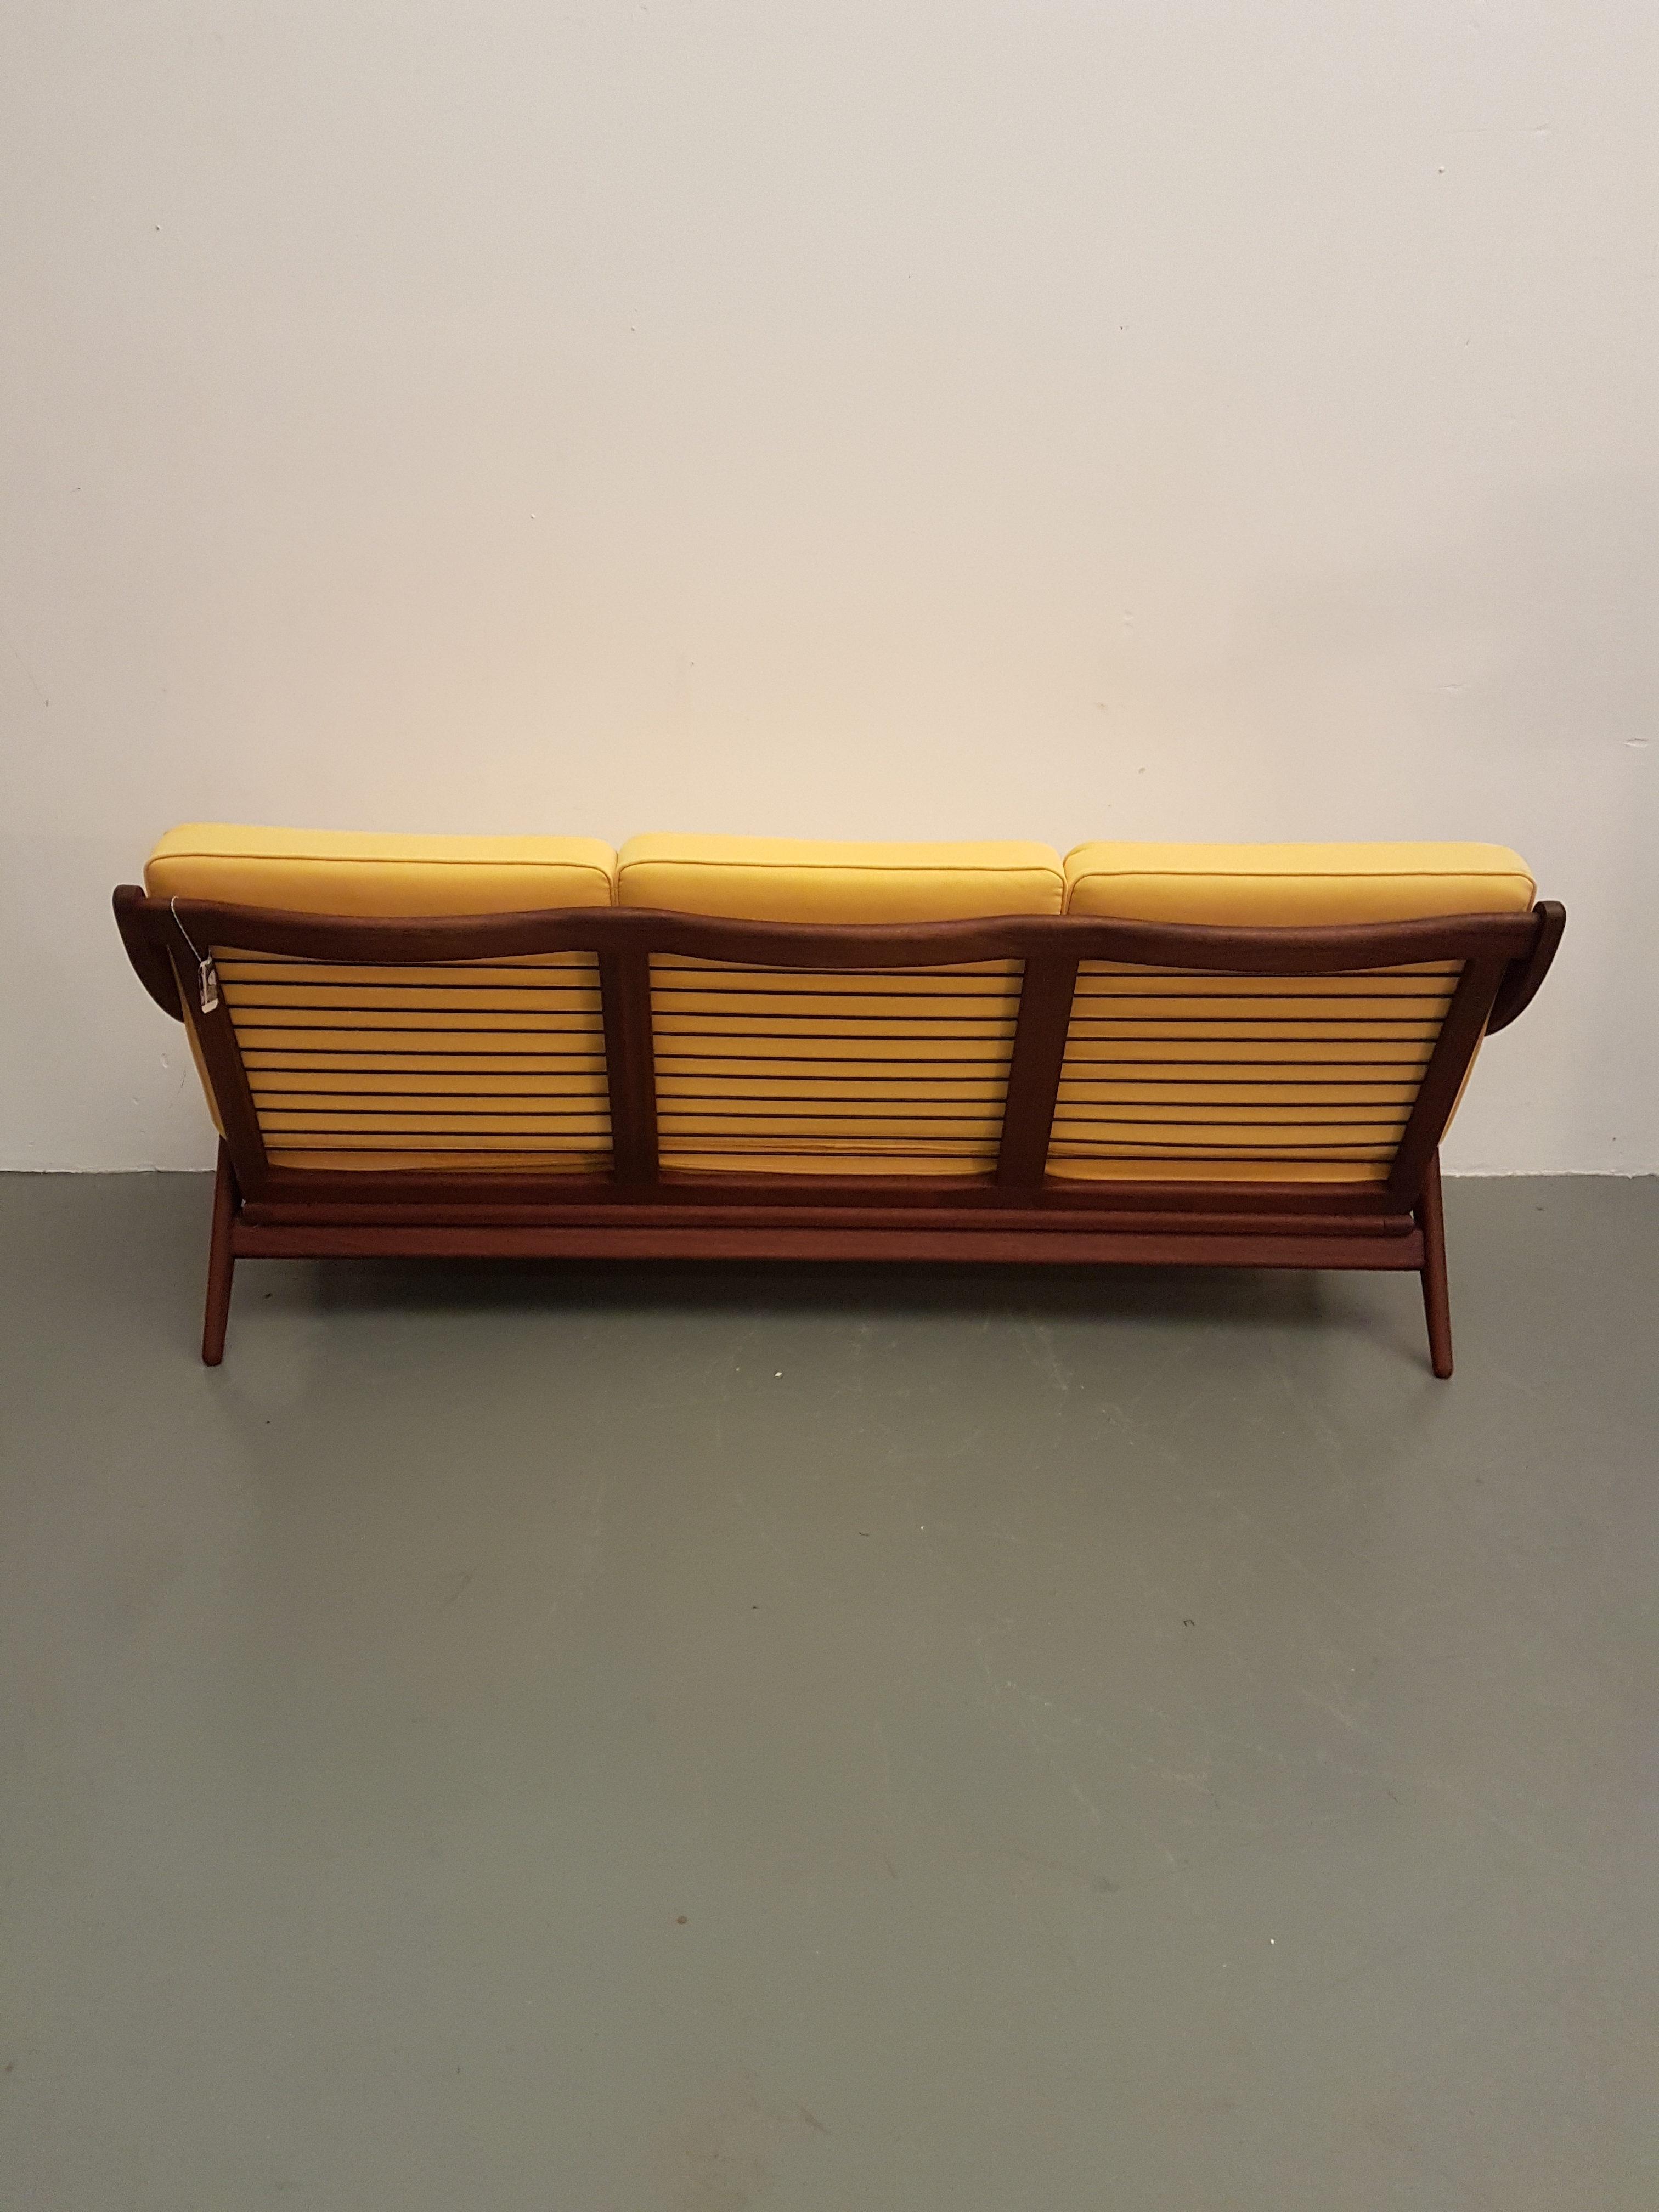 Incredible Mid Century 3 Seats Teak Sofa From De Ster Gelderland Unemploymentrelief Wooden Chair Designs For Living Room Unemploymentrelieforg